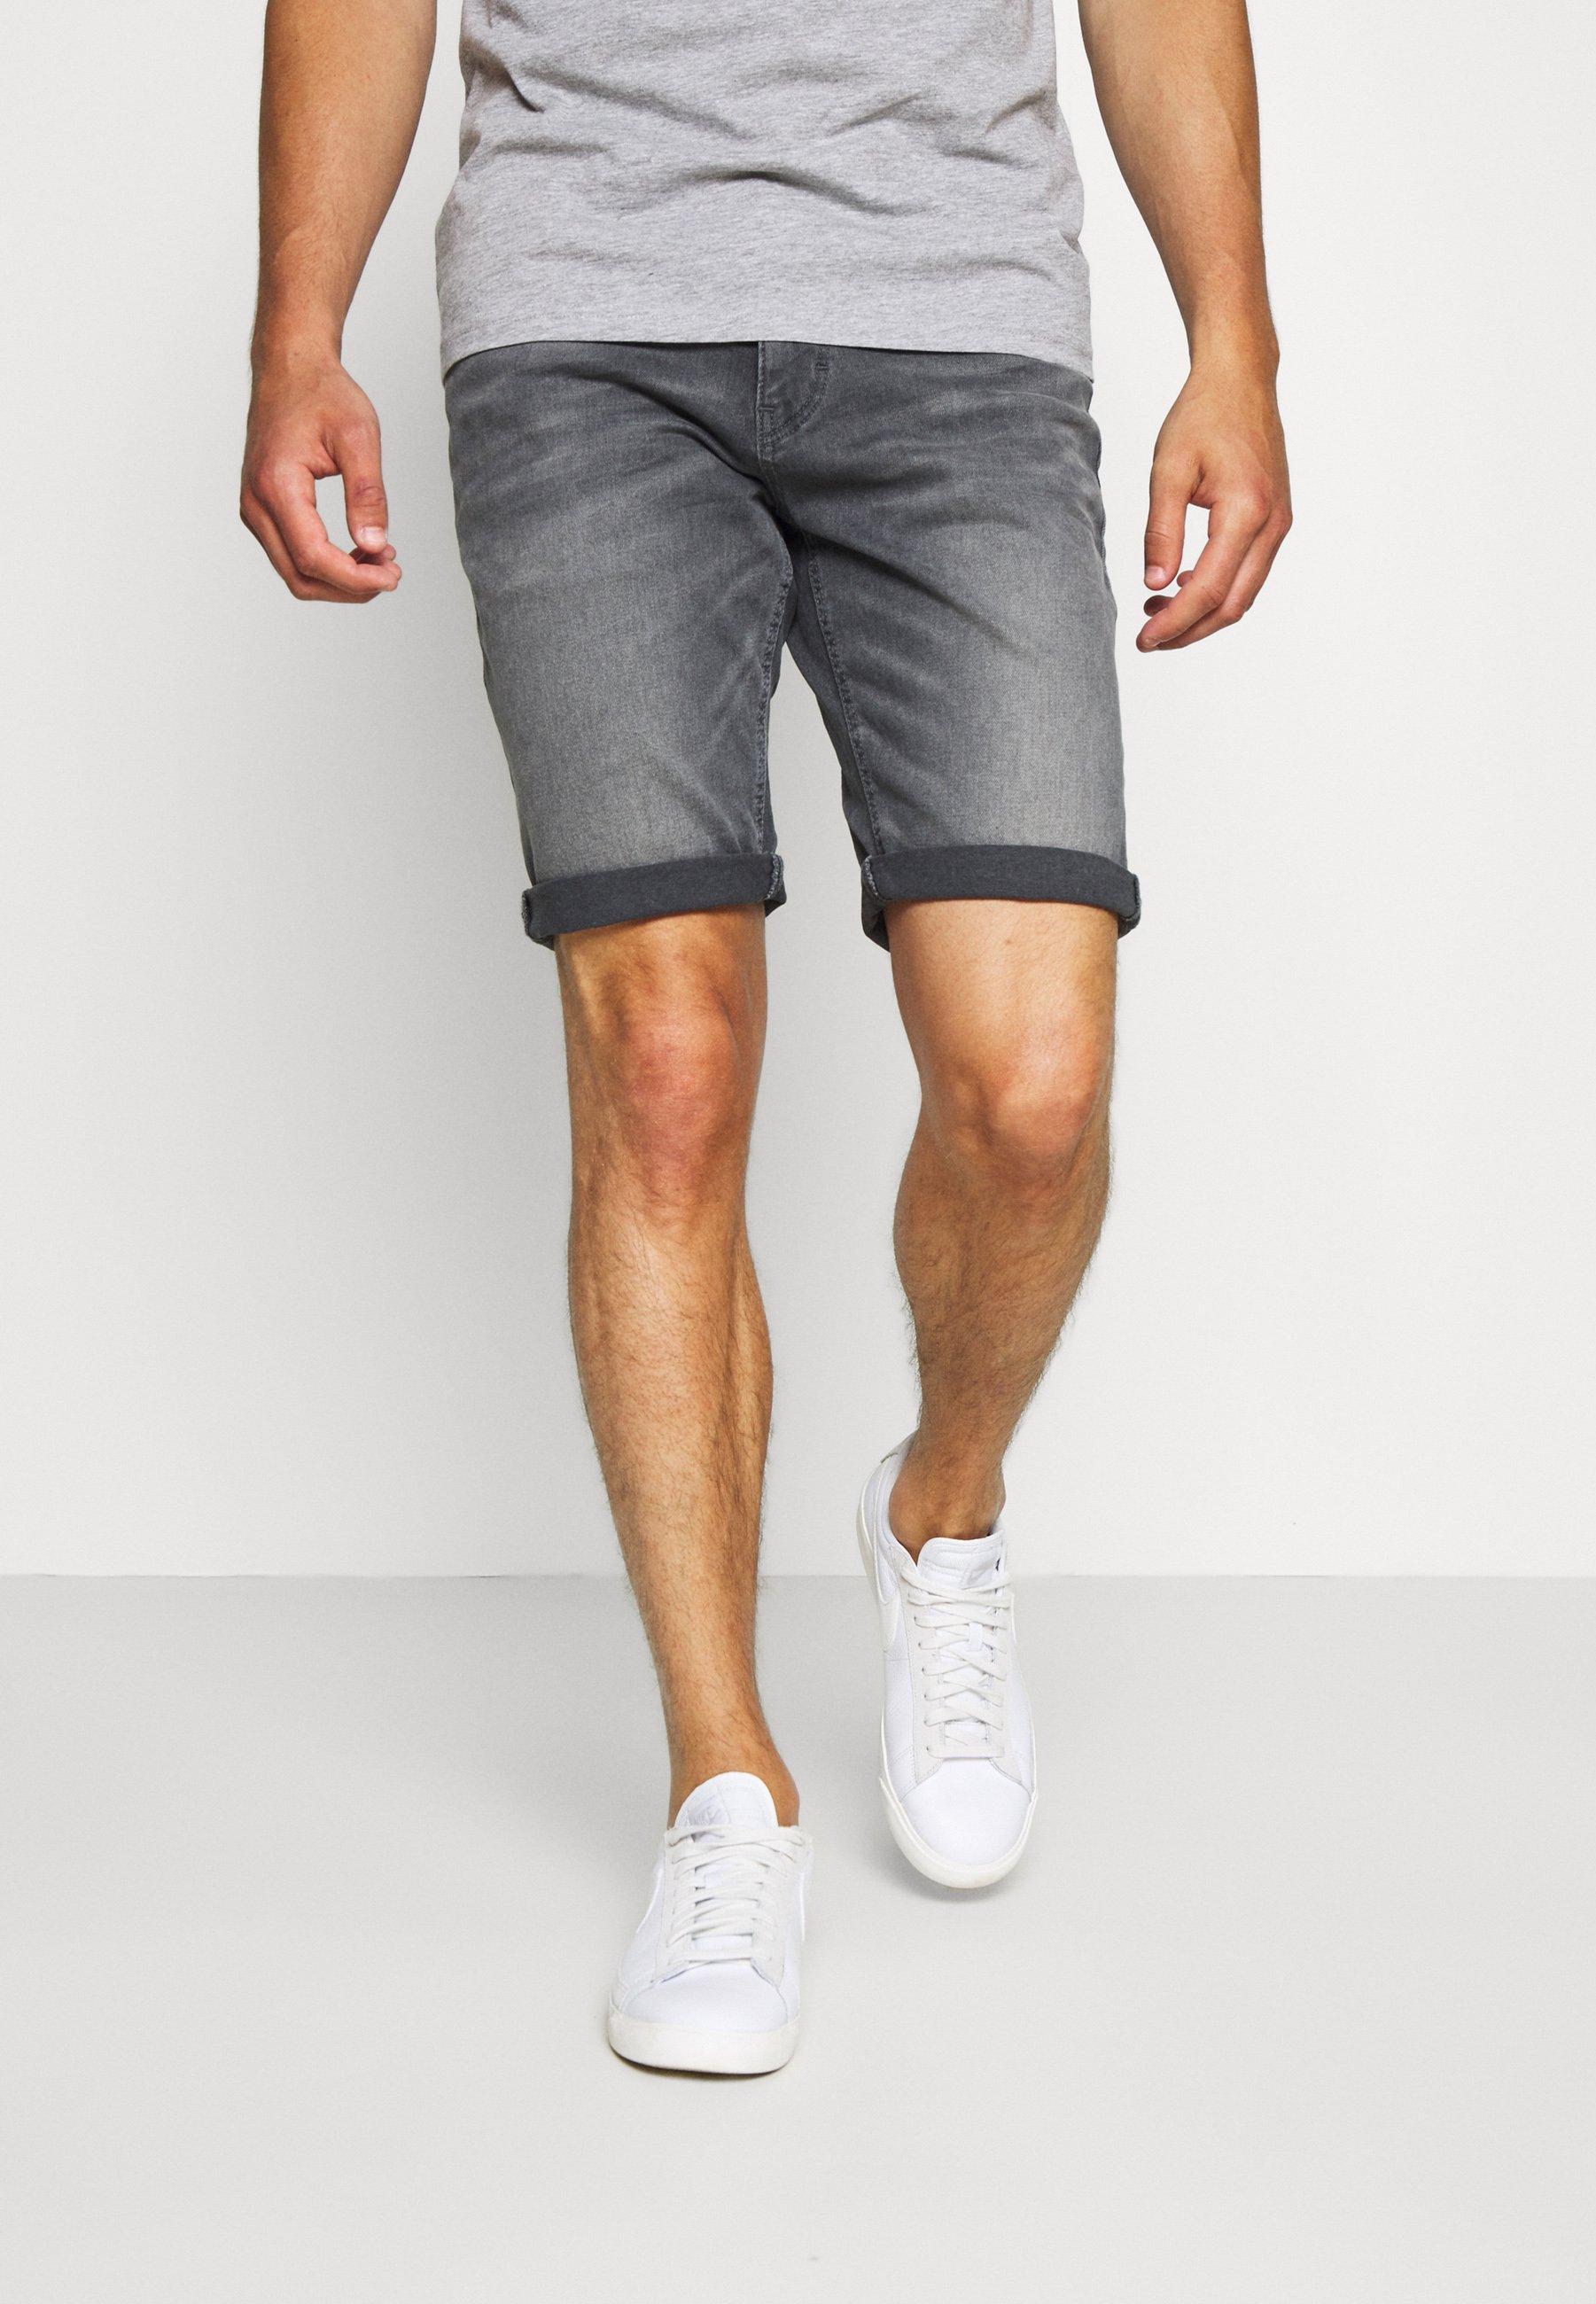 Homme JOSH SUPERSTRETCH - Short en jean